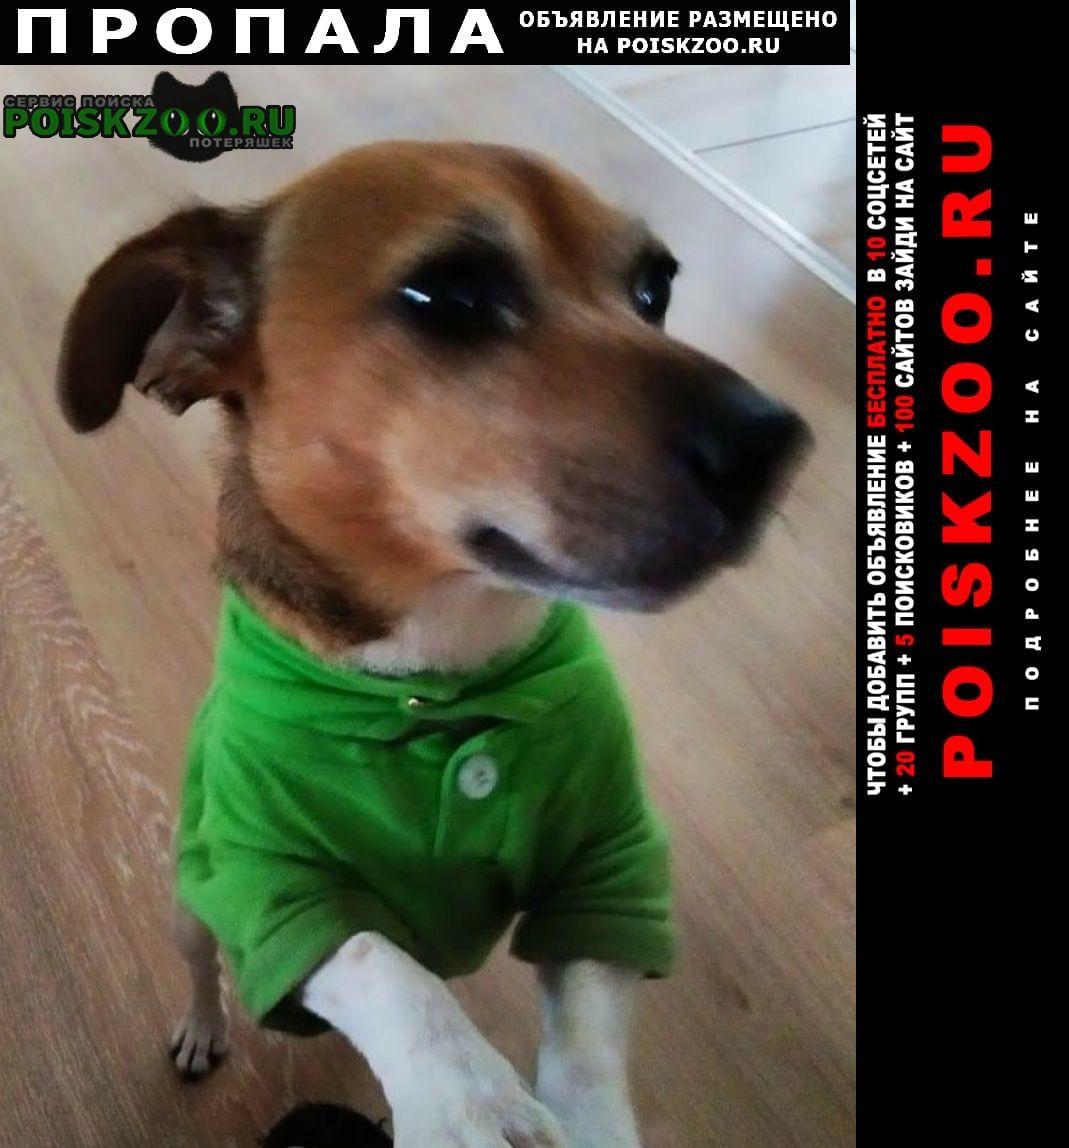 Пропала собака Пермь